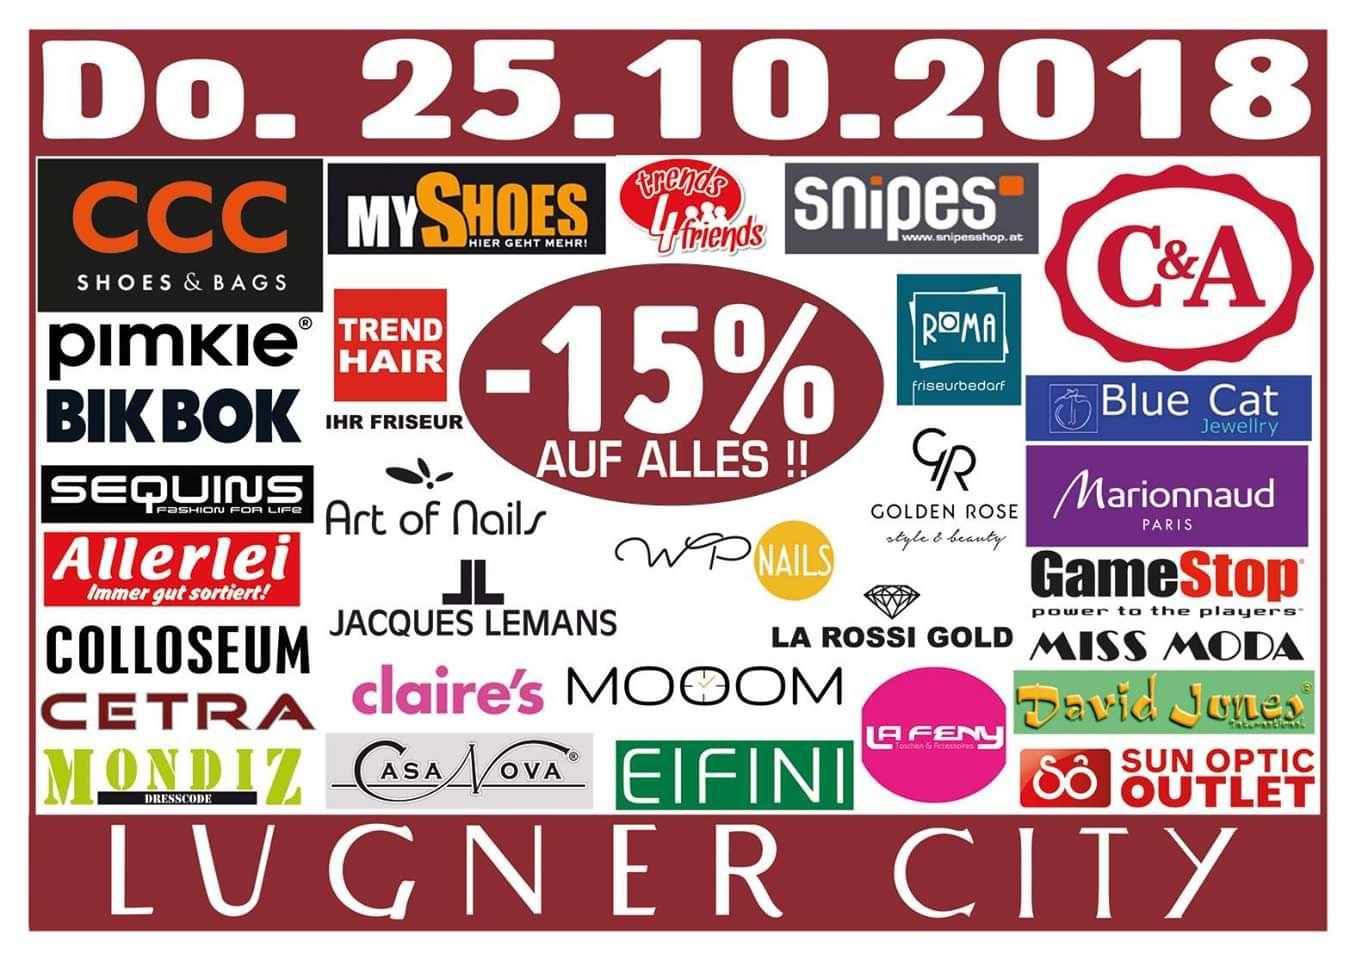 Lugner City: -15% in 31 Shops